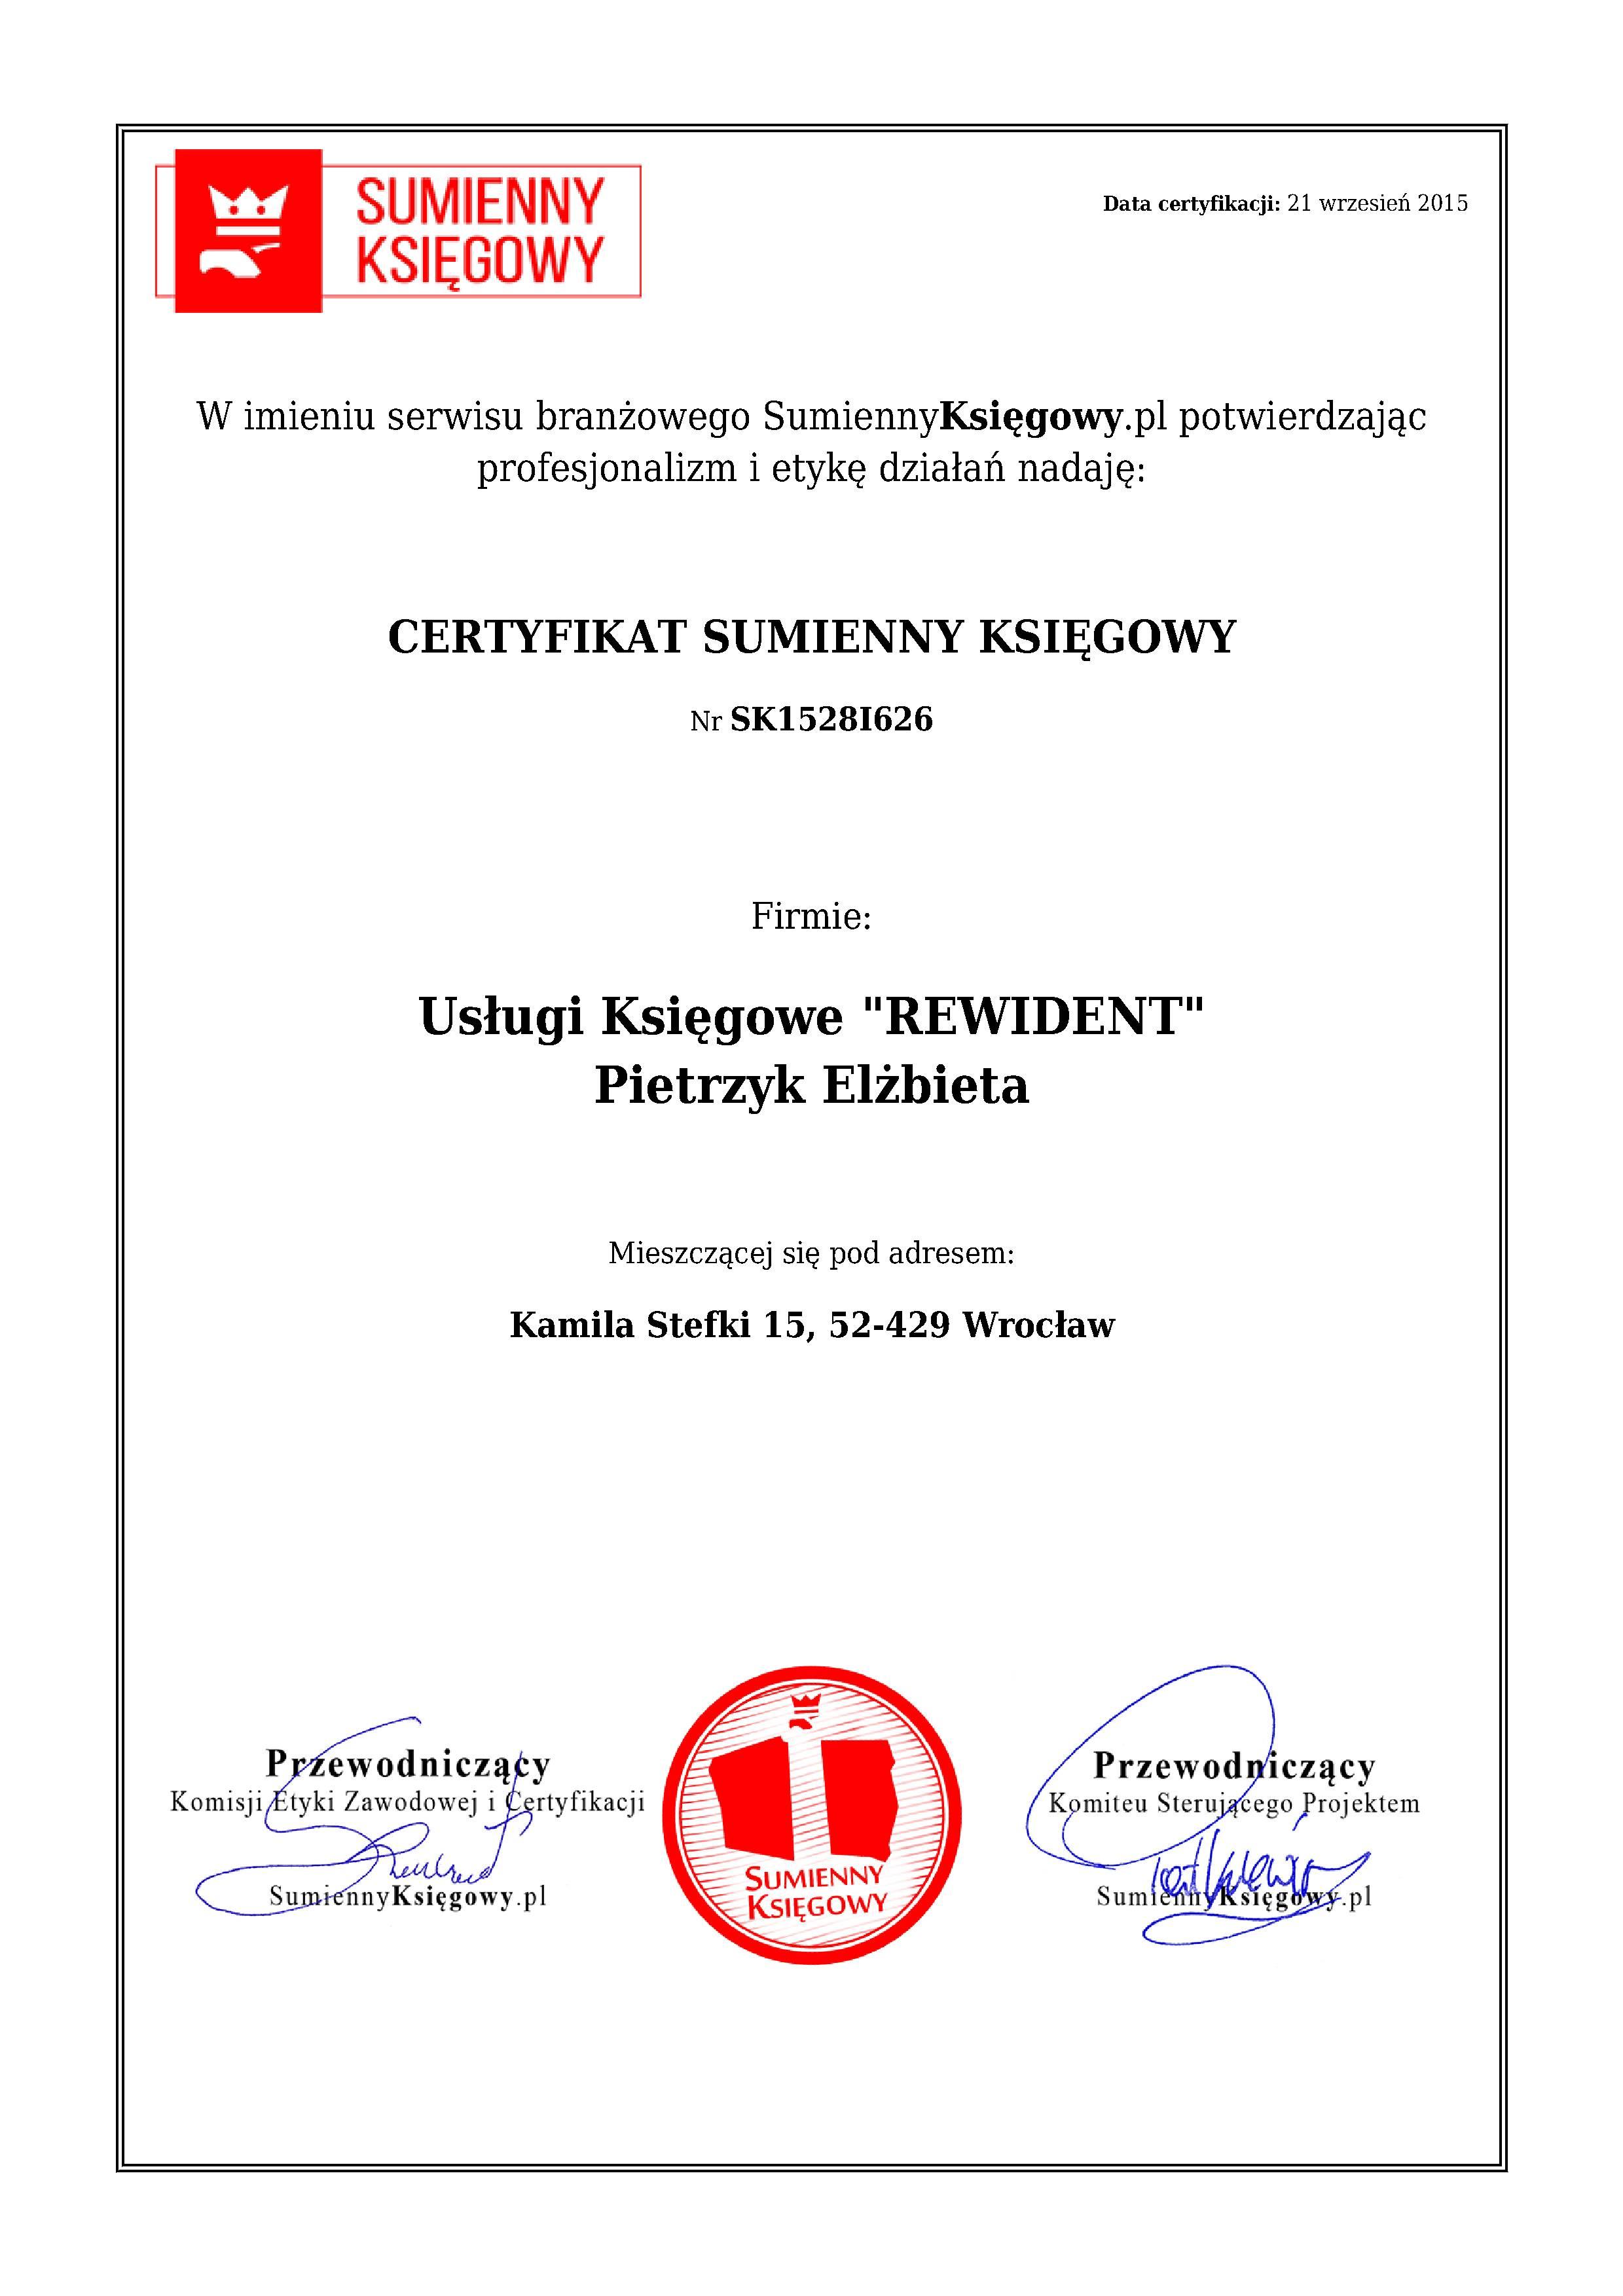 Certyfikat Usługi Księgowe